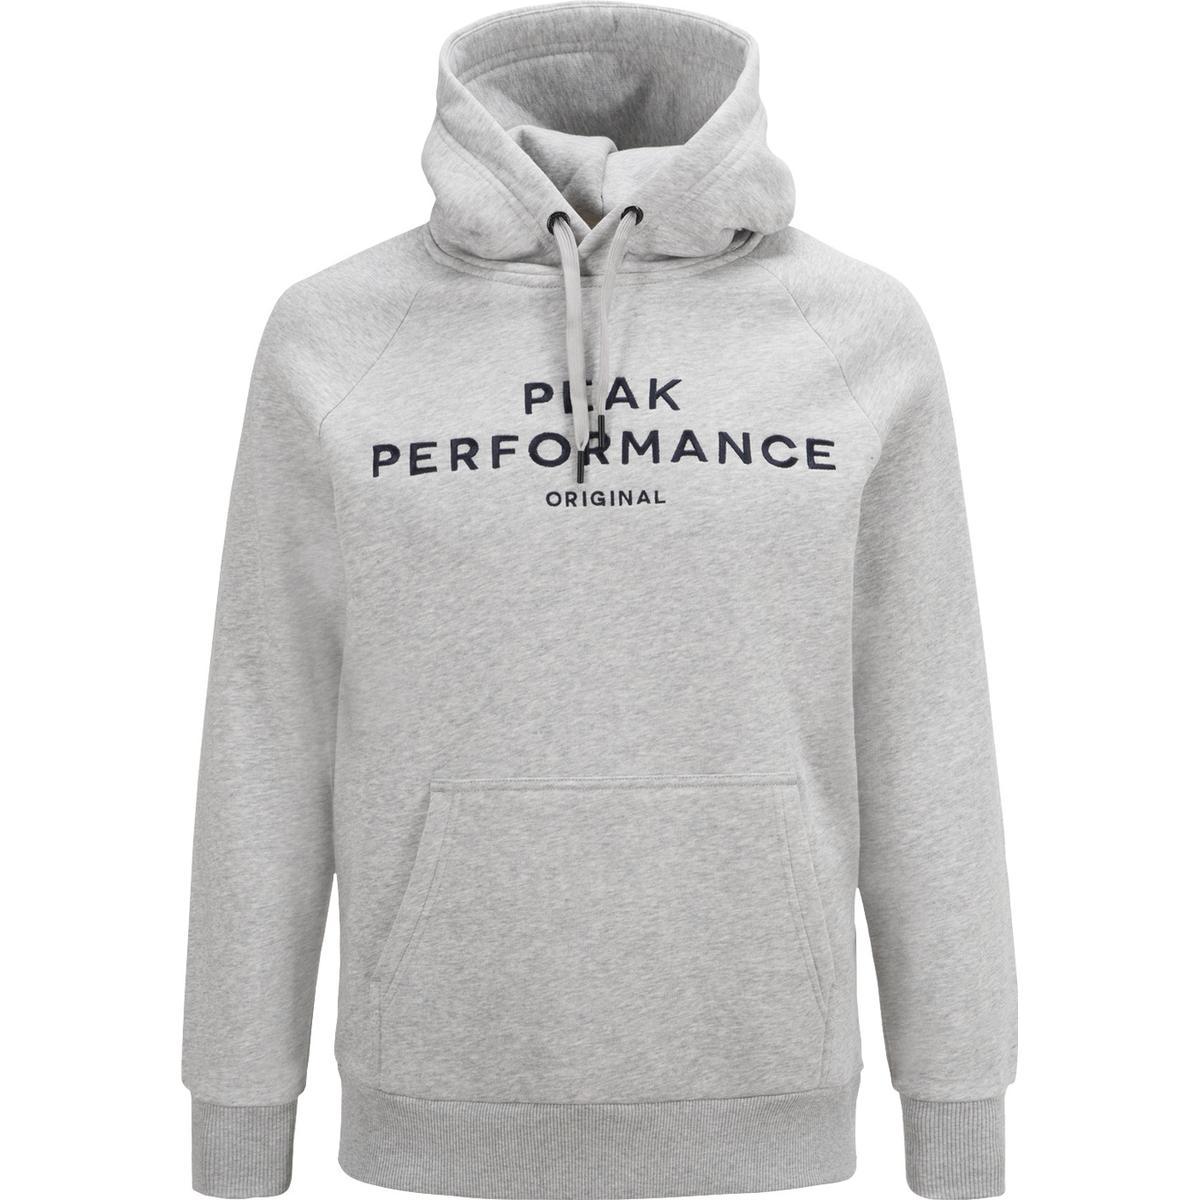 4d748282 Peak Performance Hoodie Herrkläder - Jämför priser på luvtröja PriceRunner